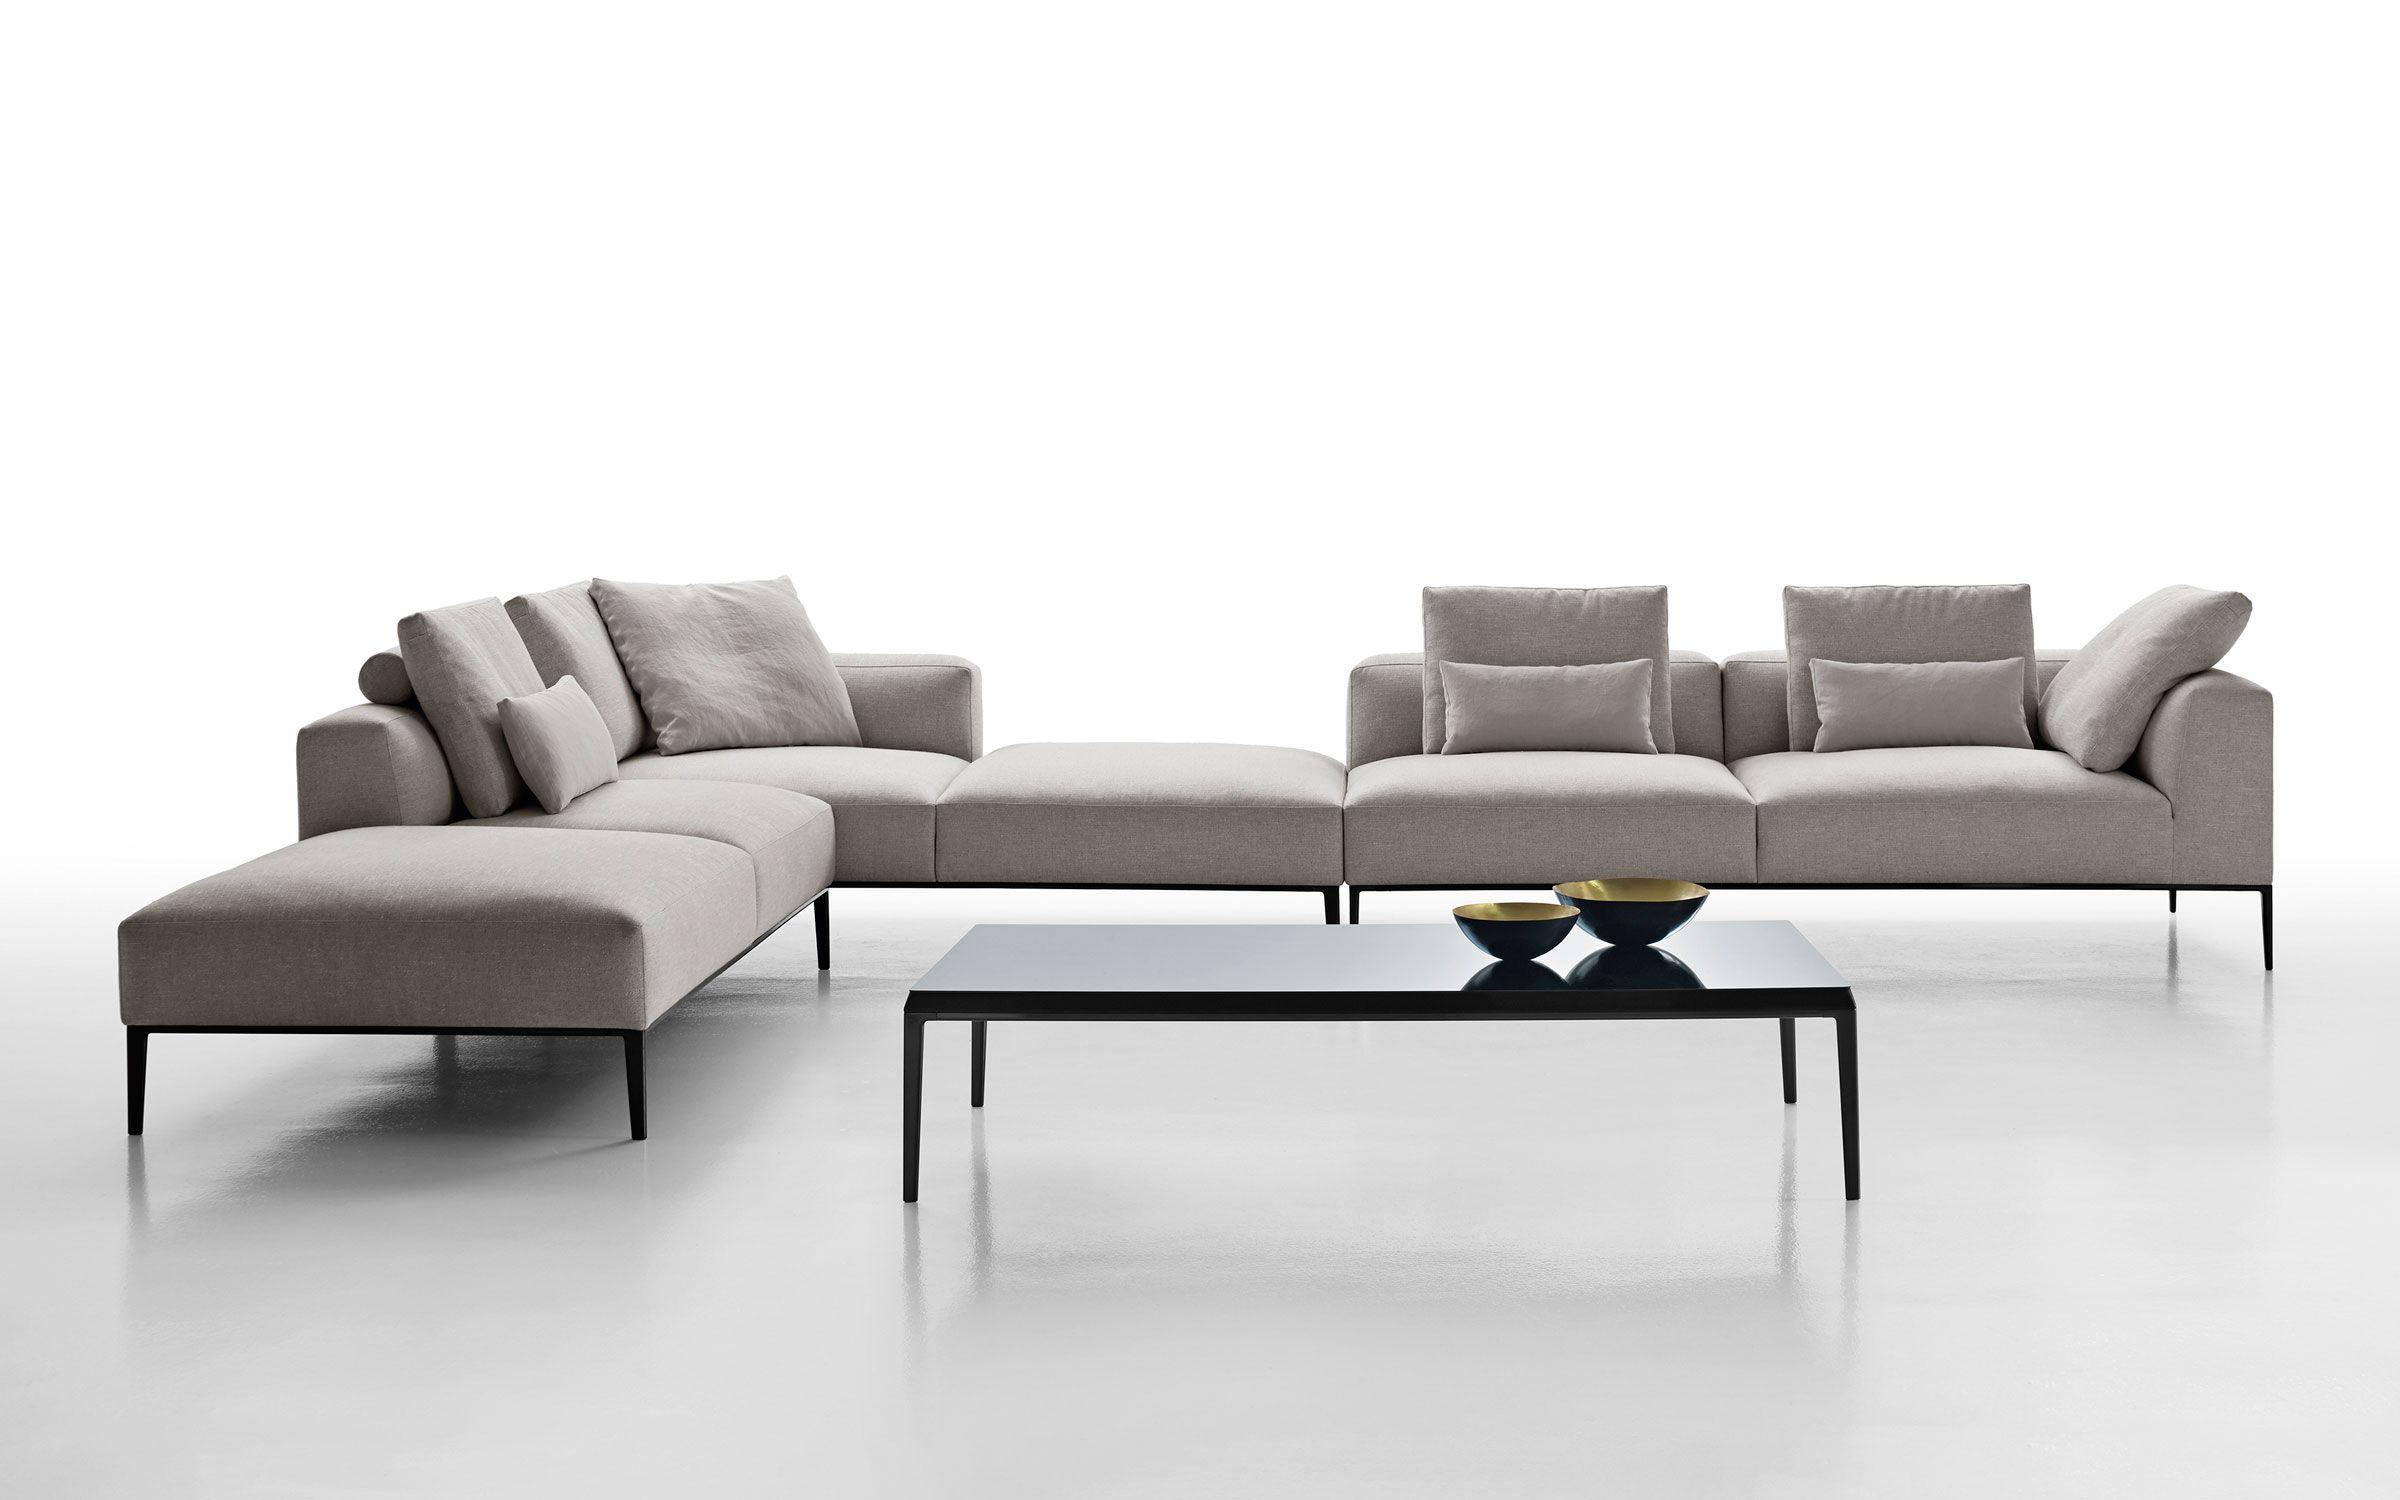 Sofa MICHEL Collection B&B Italia Design Antonio Citterio